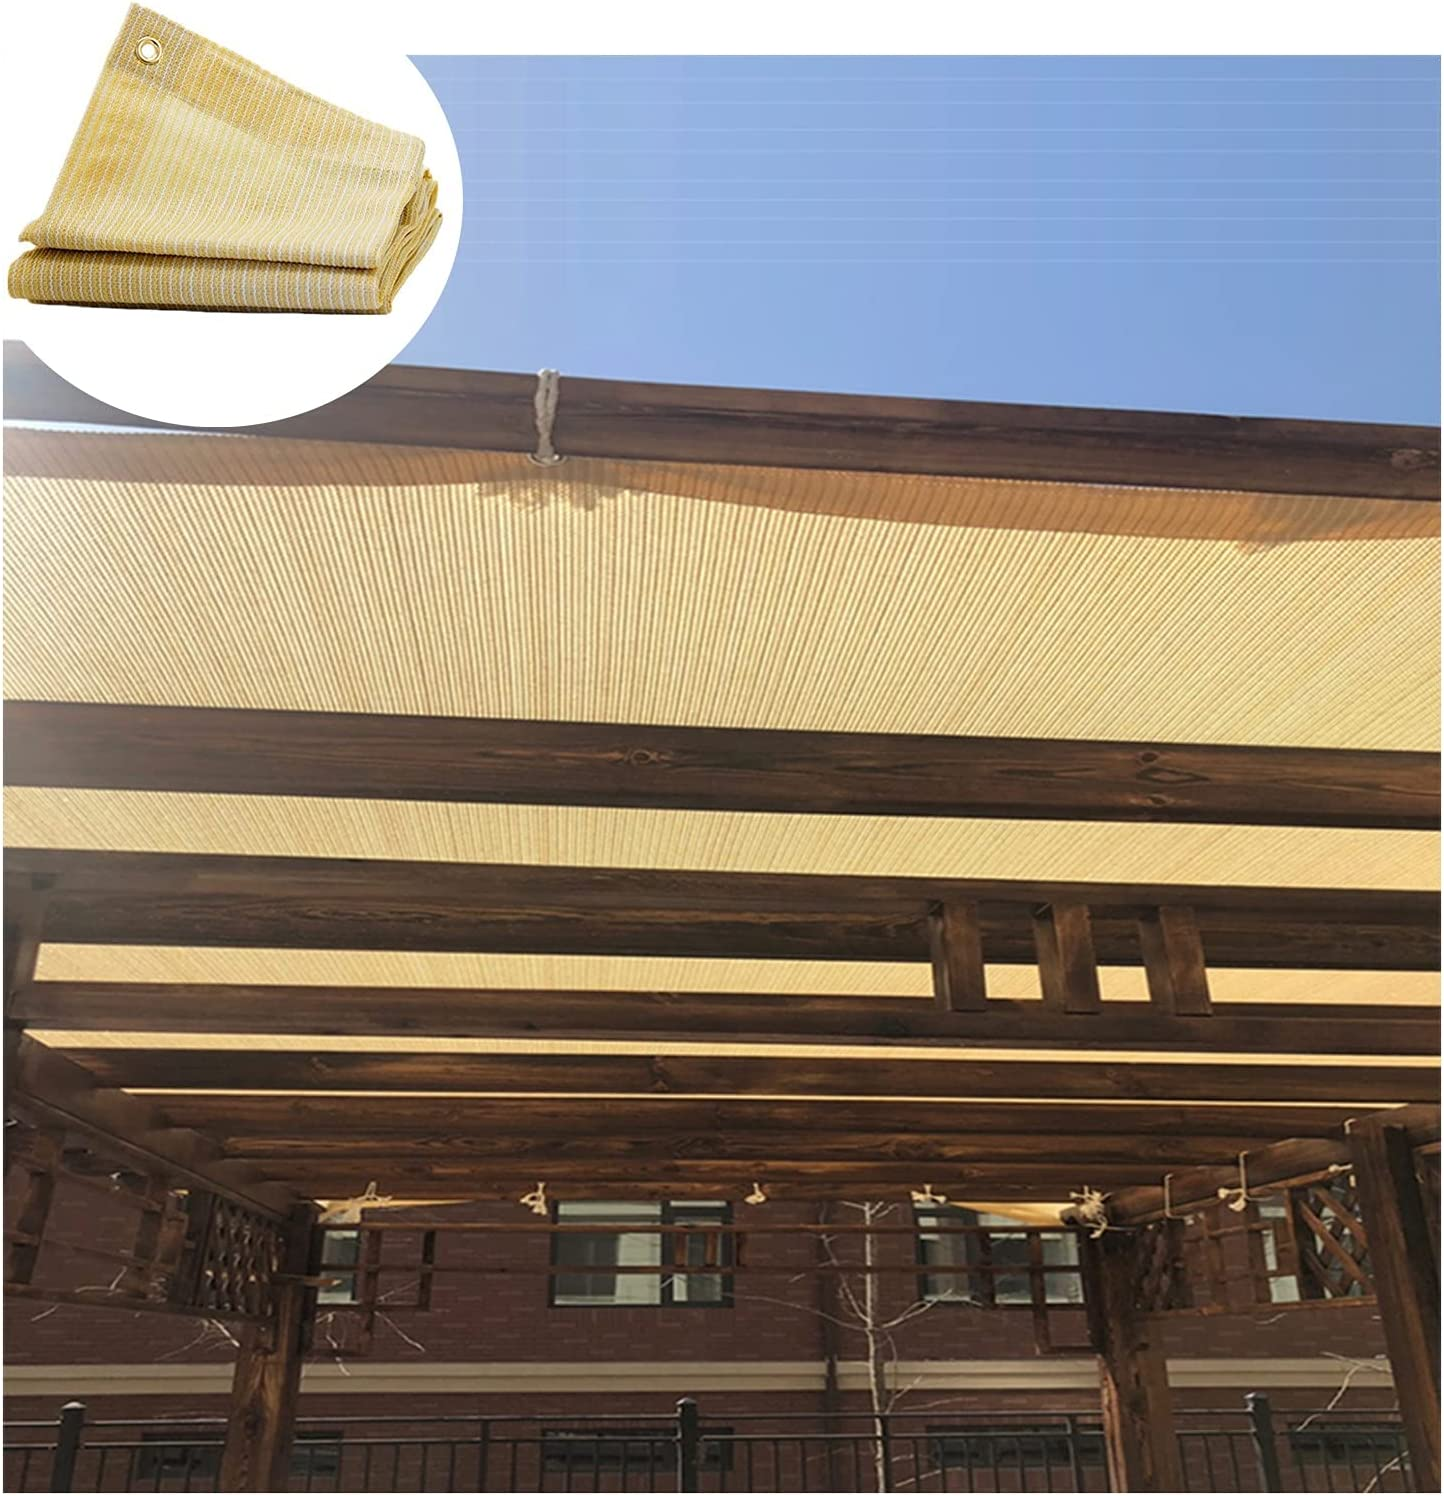 GZHENH OFFicial shop Shade Cloth Pergola Cover Canopy Sunblock H Department store Patio